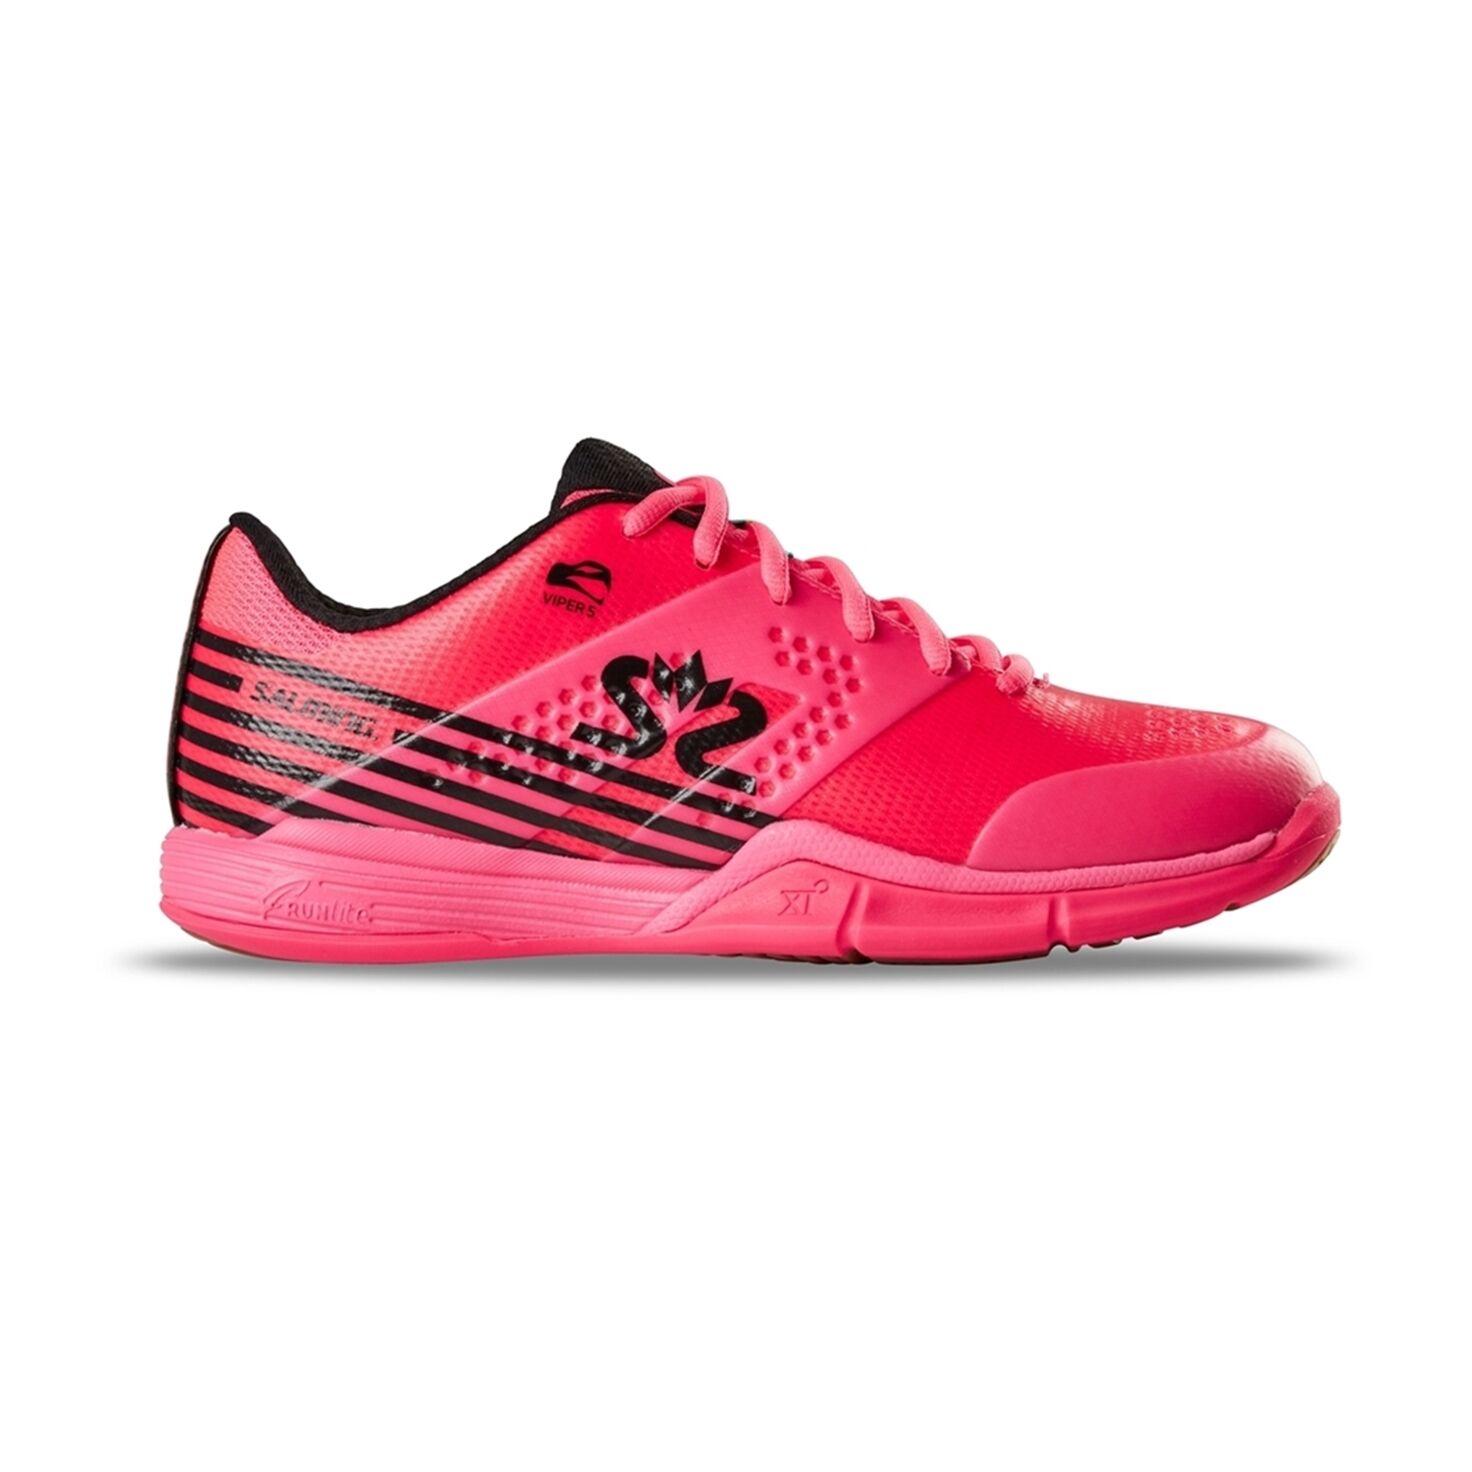 Salming Viper 5 Women Pink/Black 38